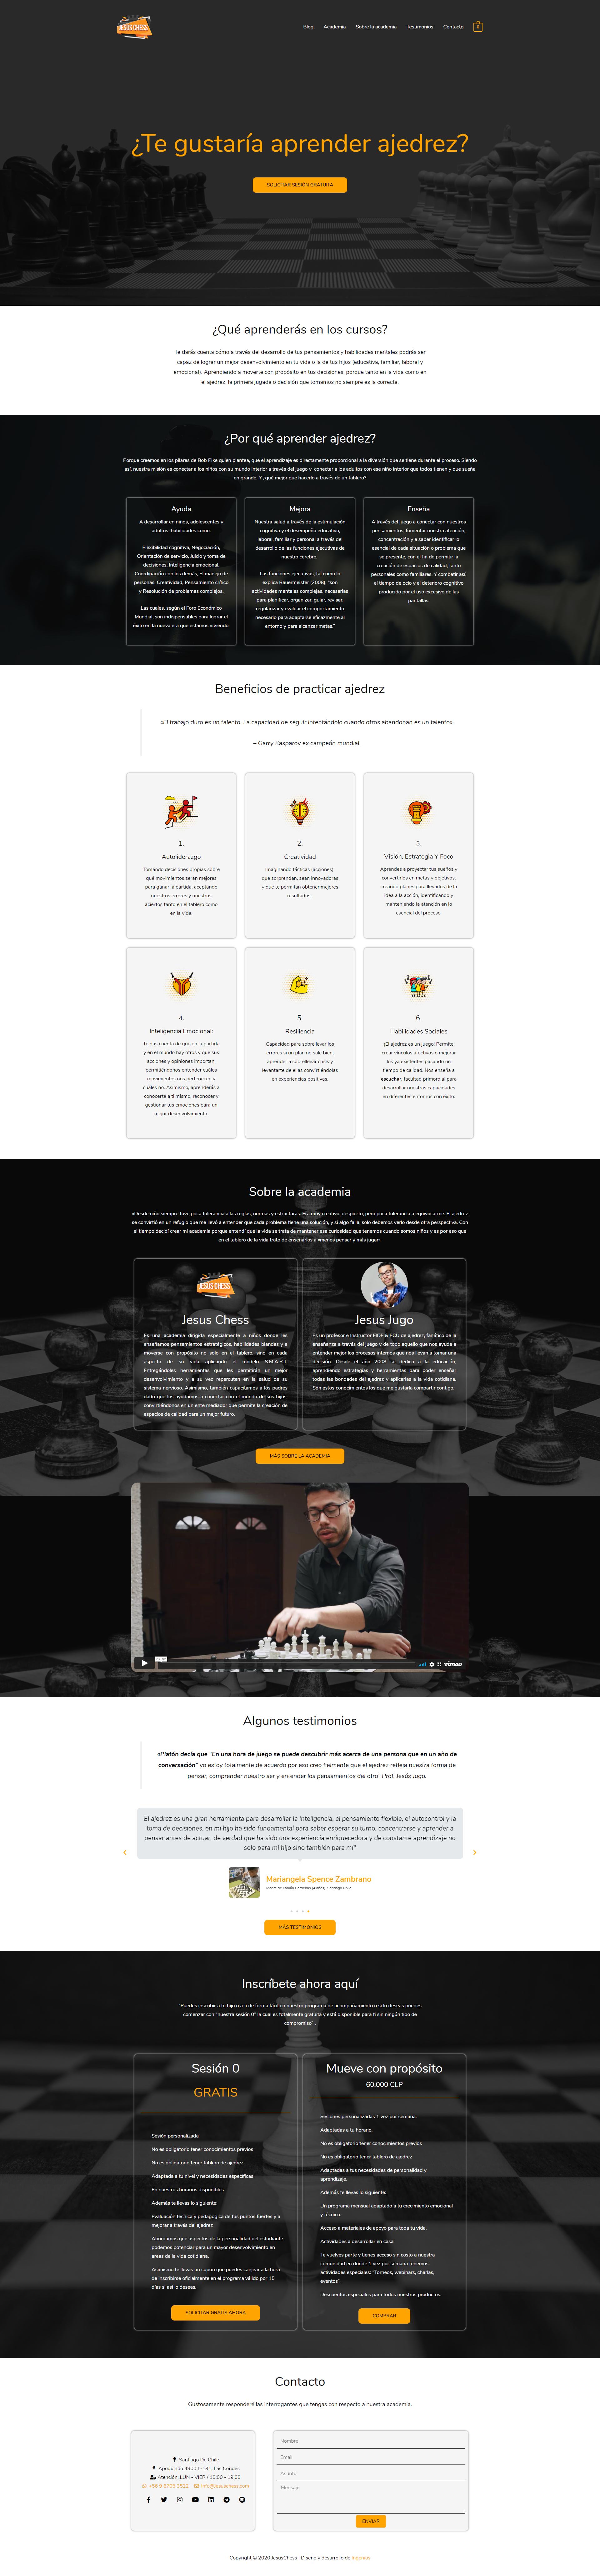 academia para aprender ajedrez